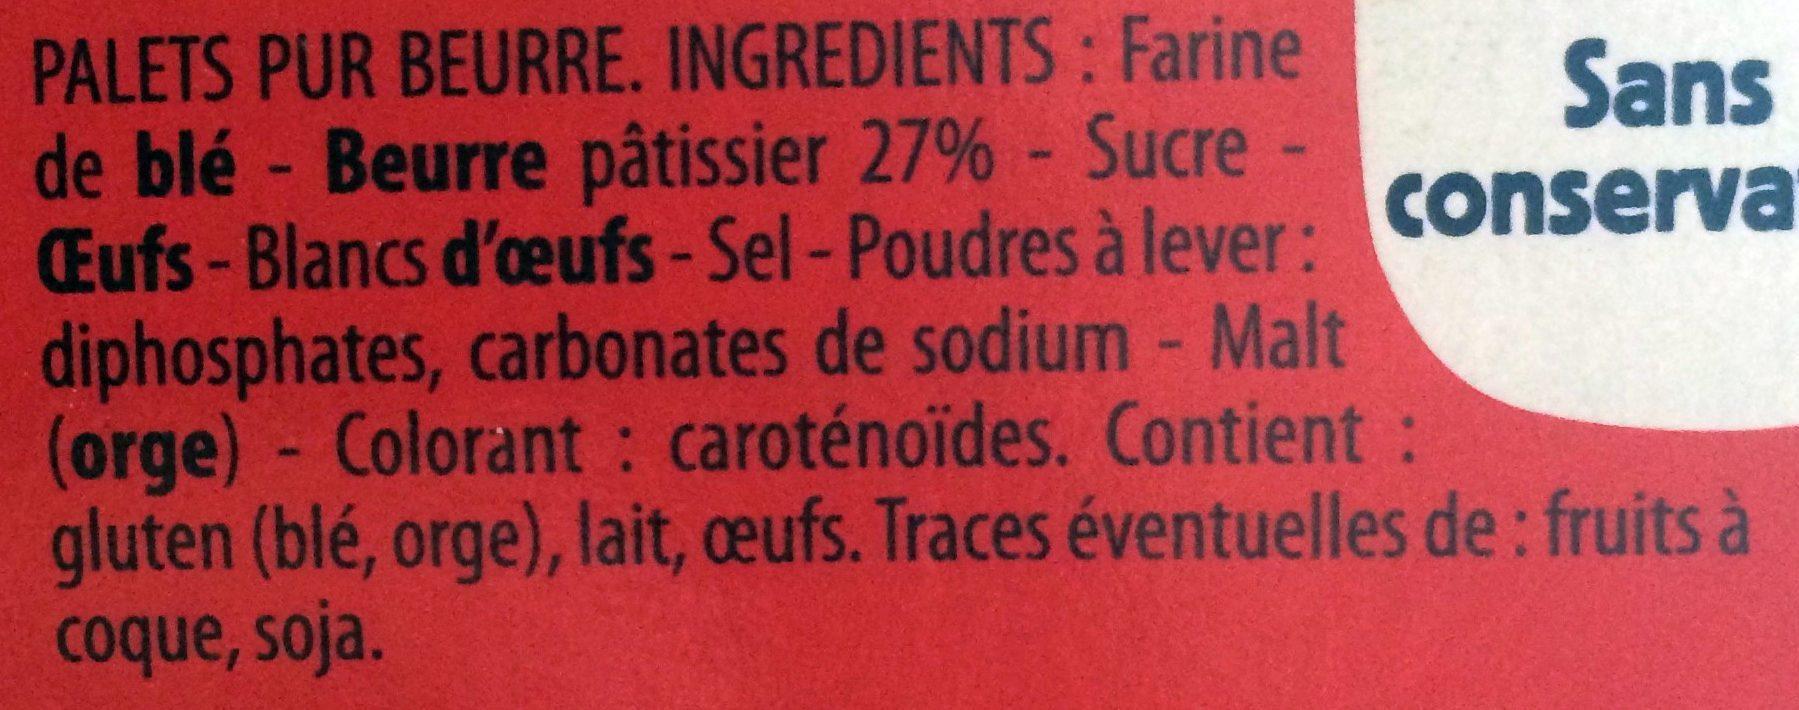 Les Palets Pur Beurre - Ingredienti - fr